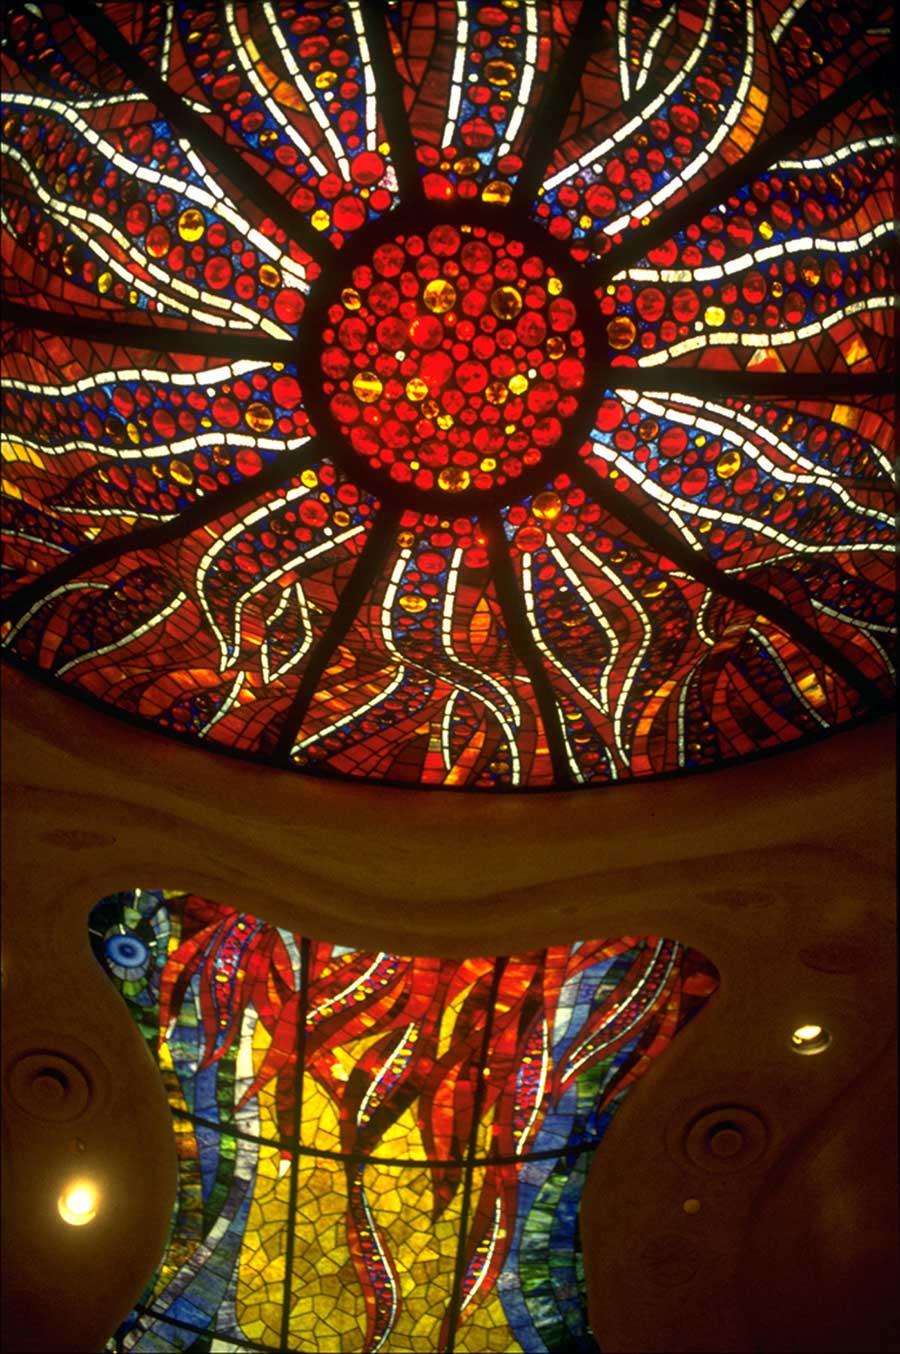 Sunset Station Casino Gaudi Bar